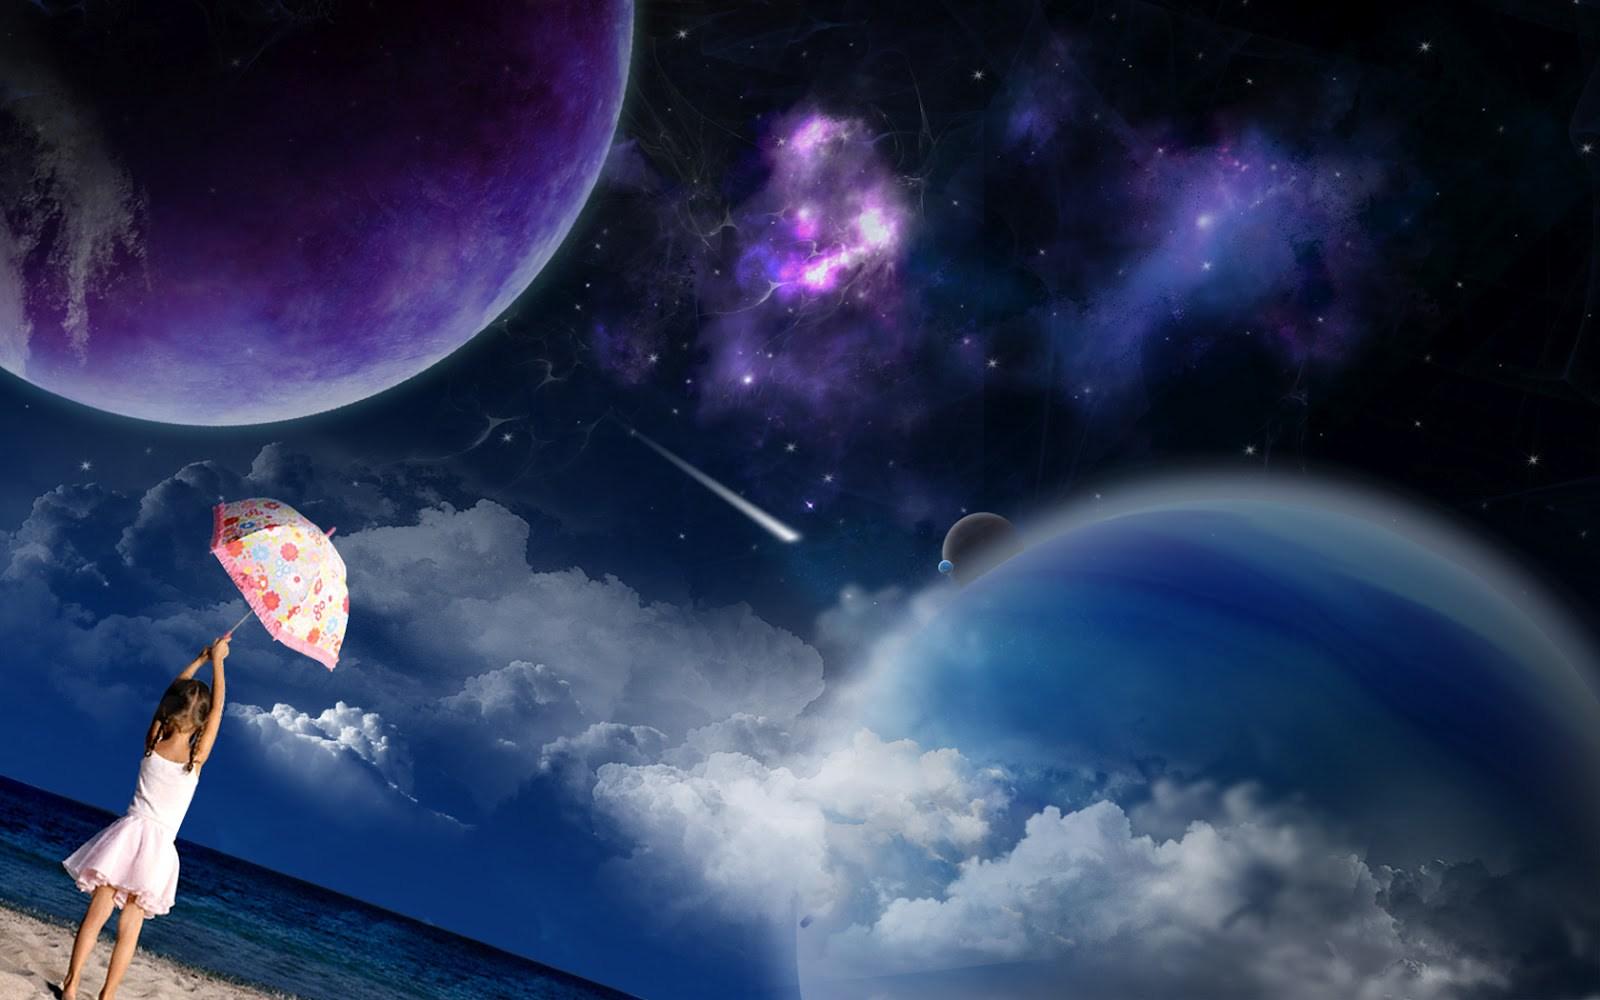 universo2.jpg